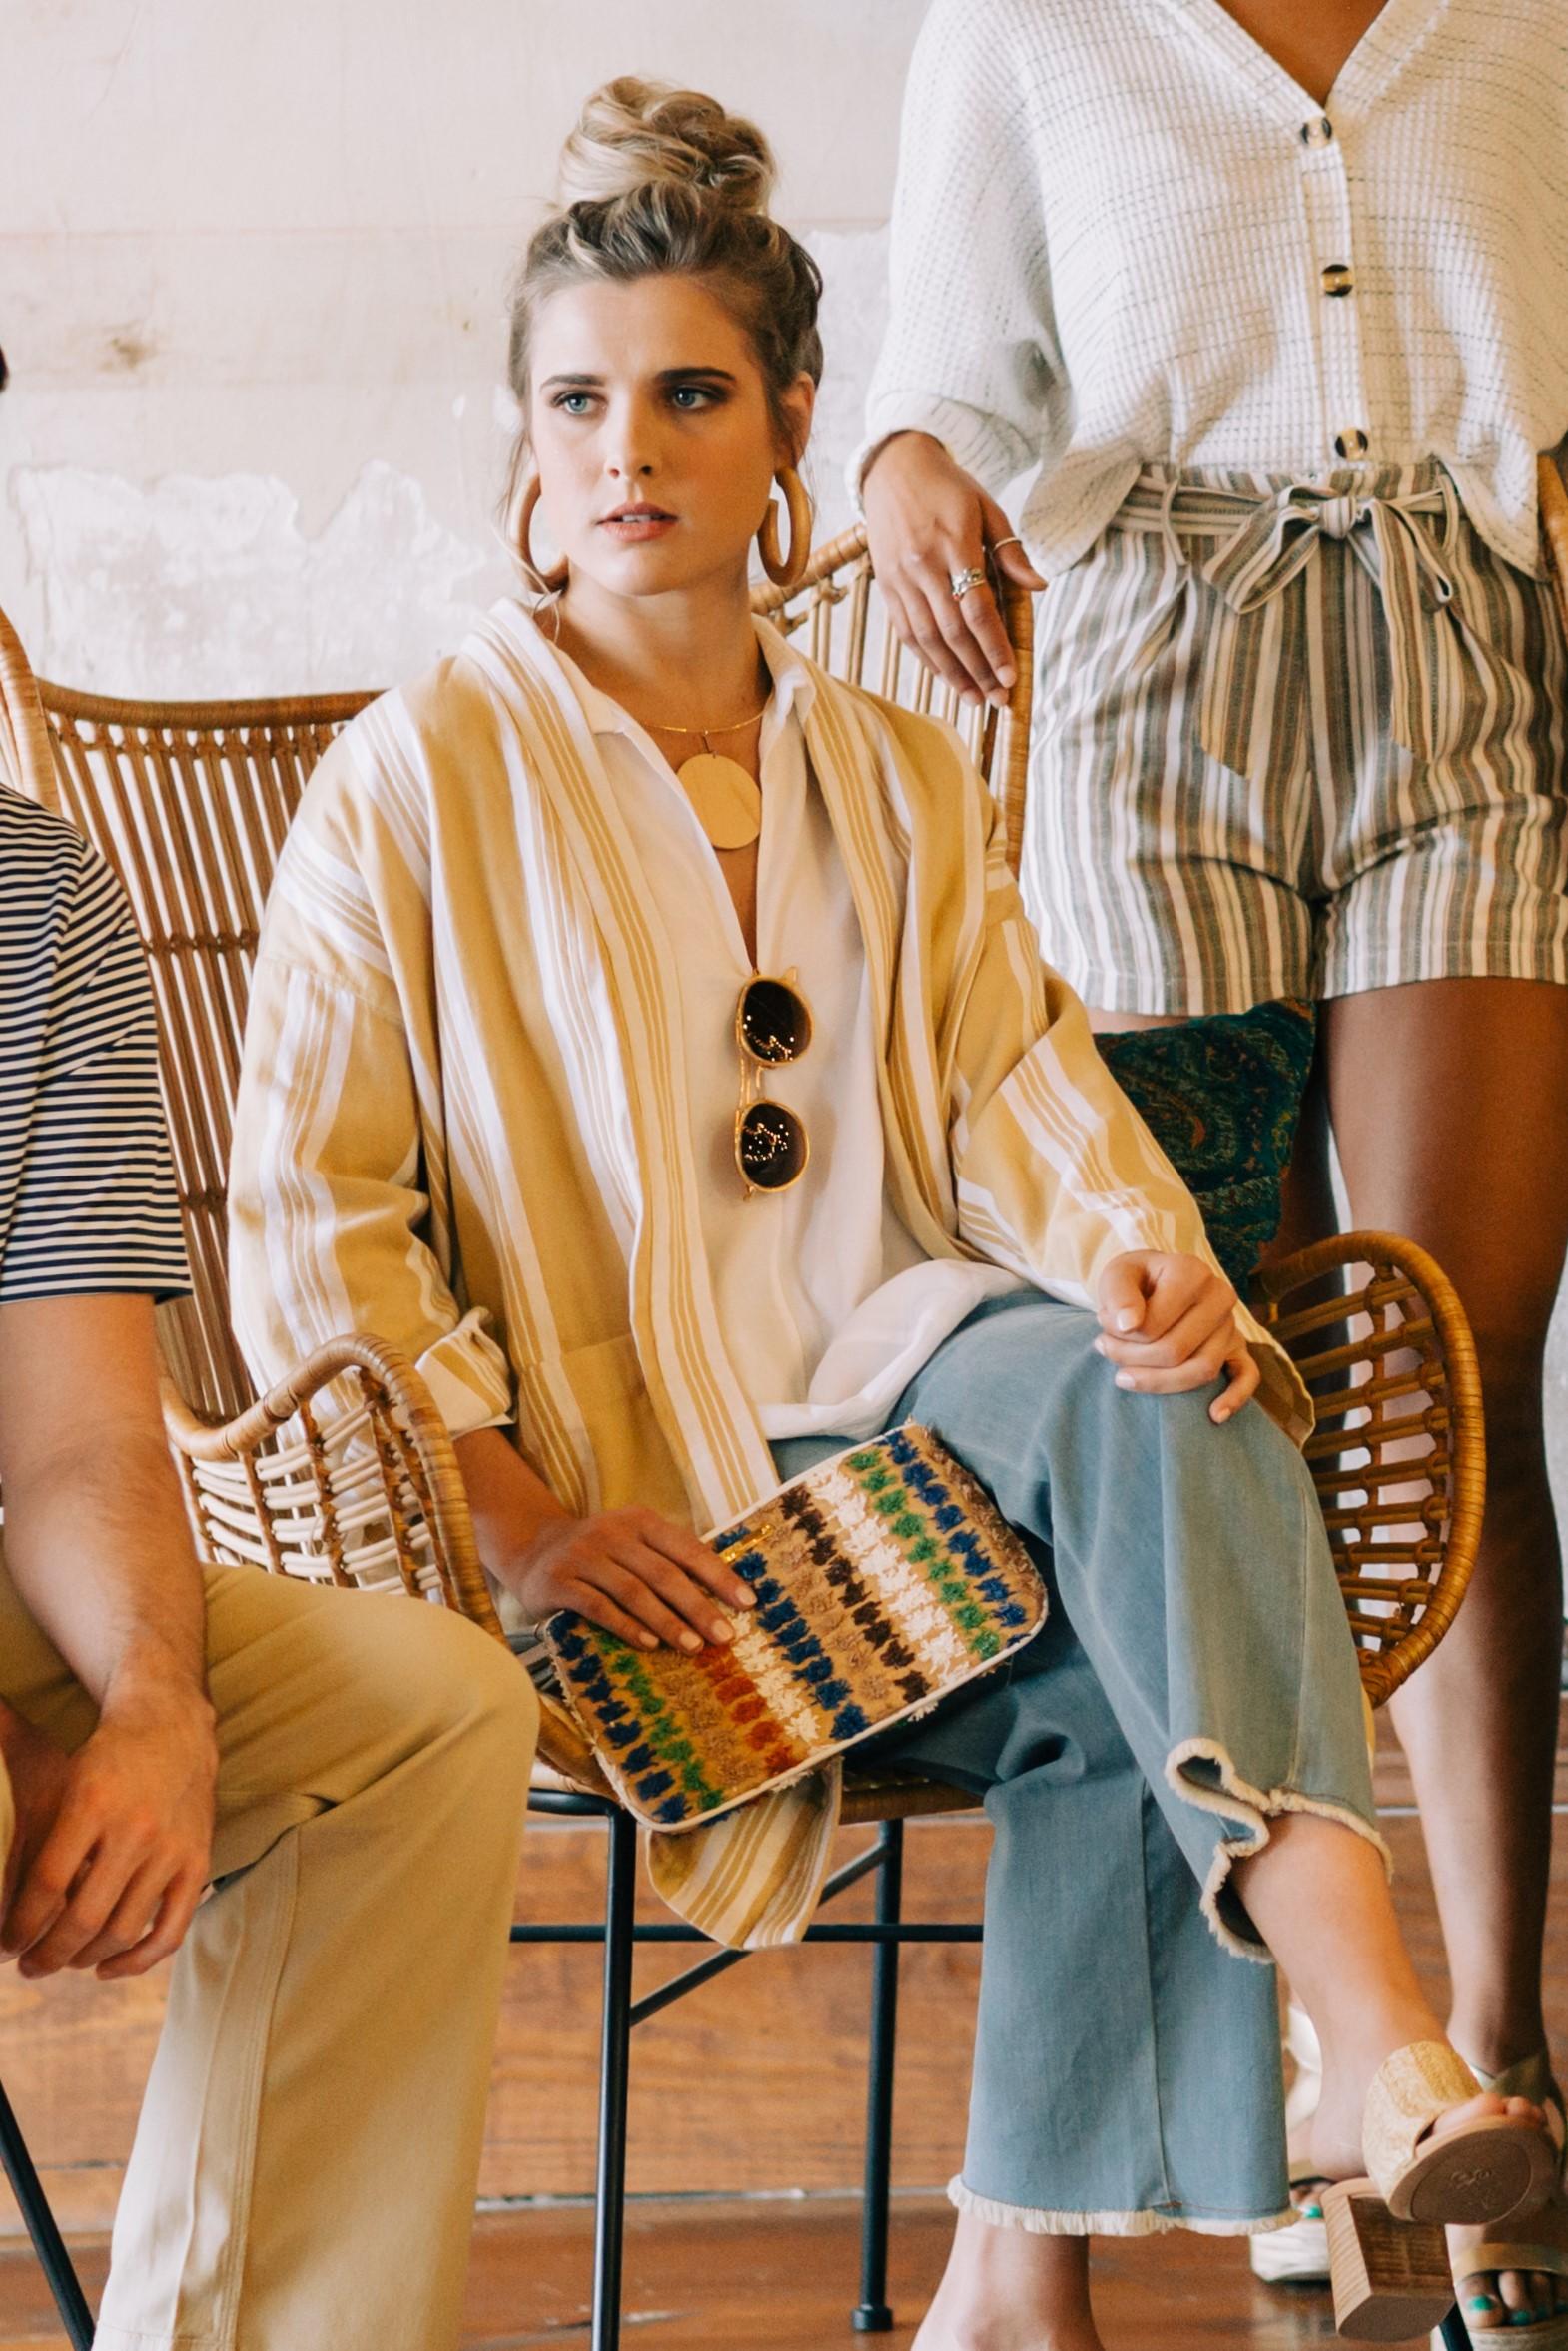 The Fashion of Ruston